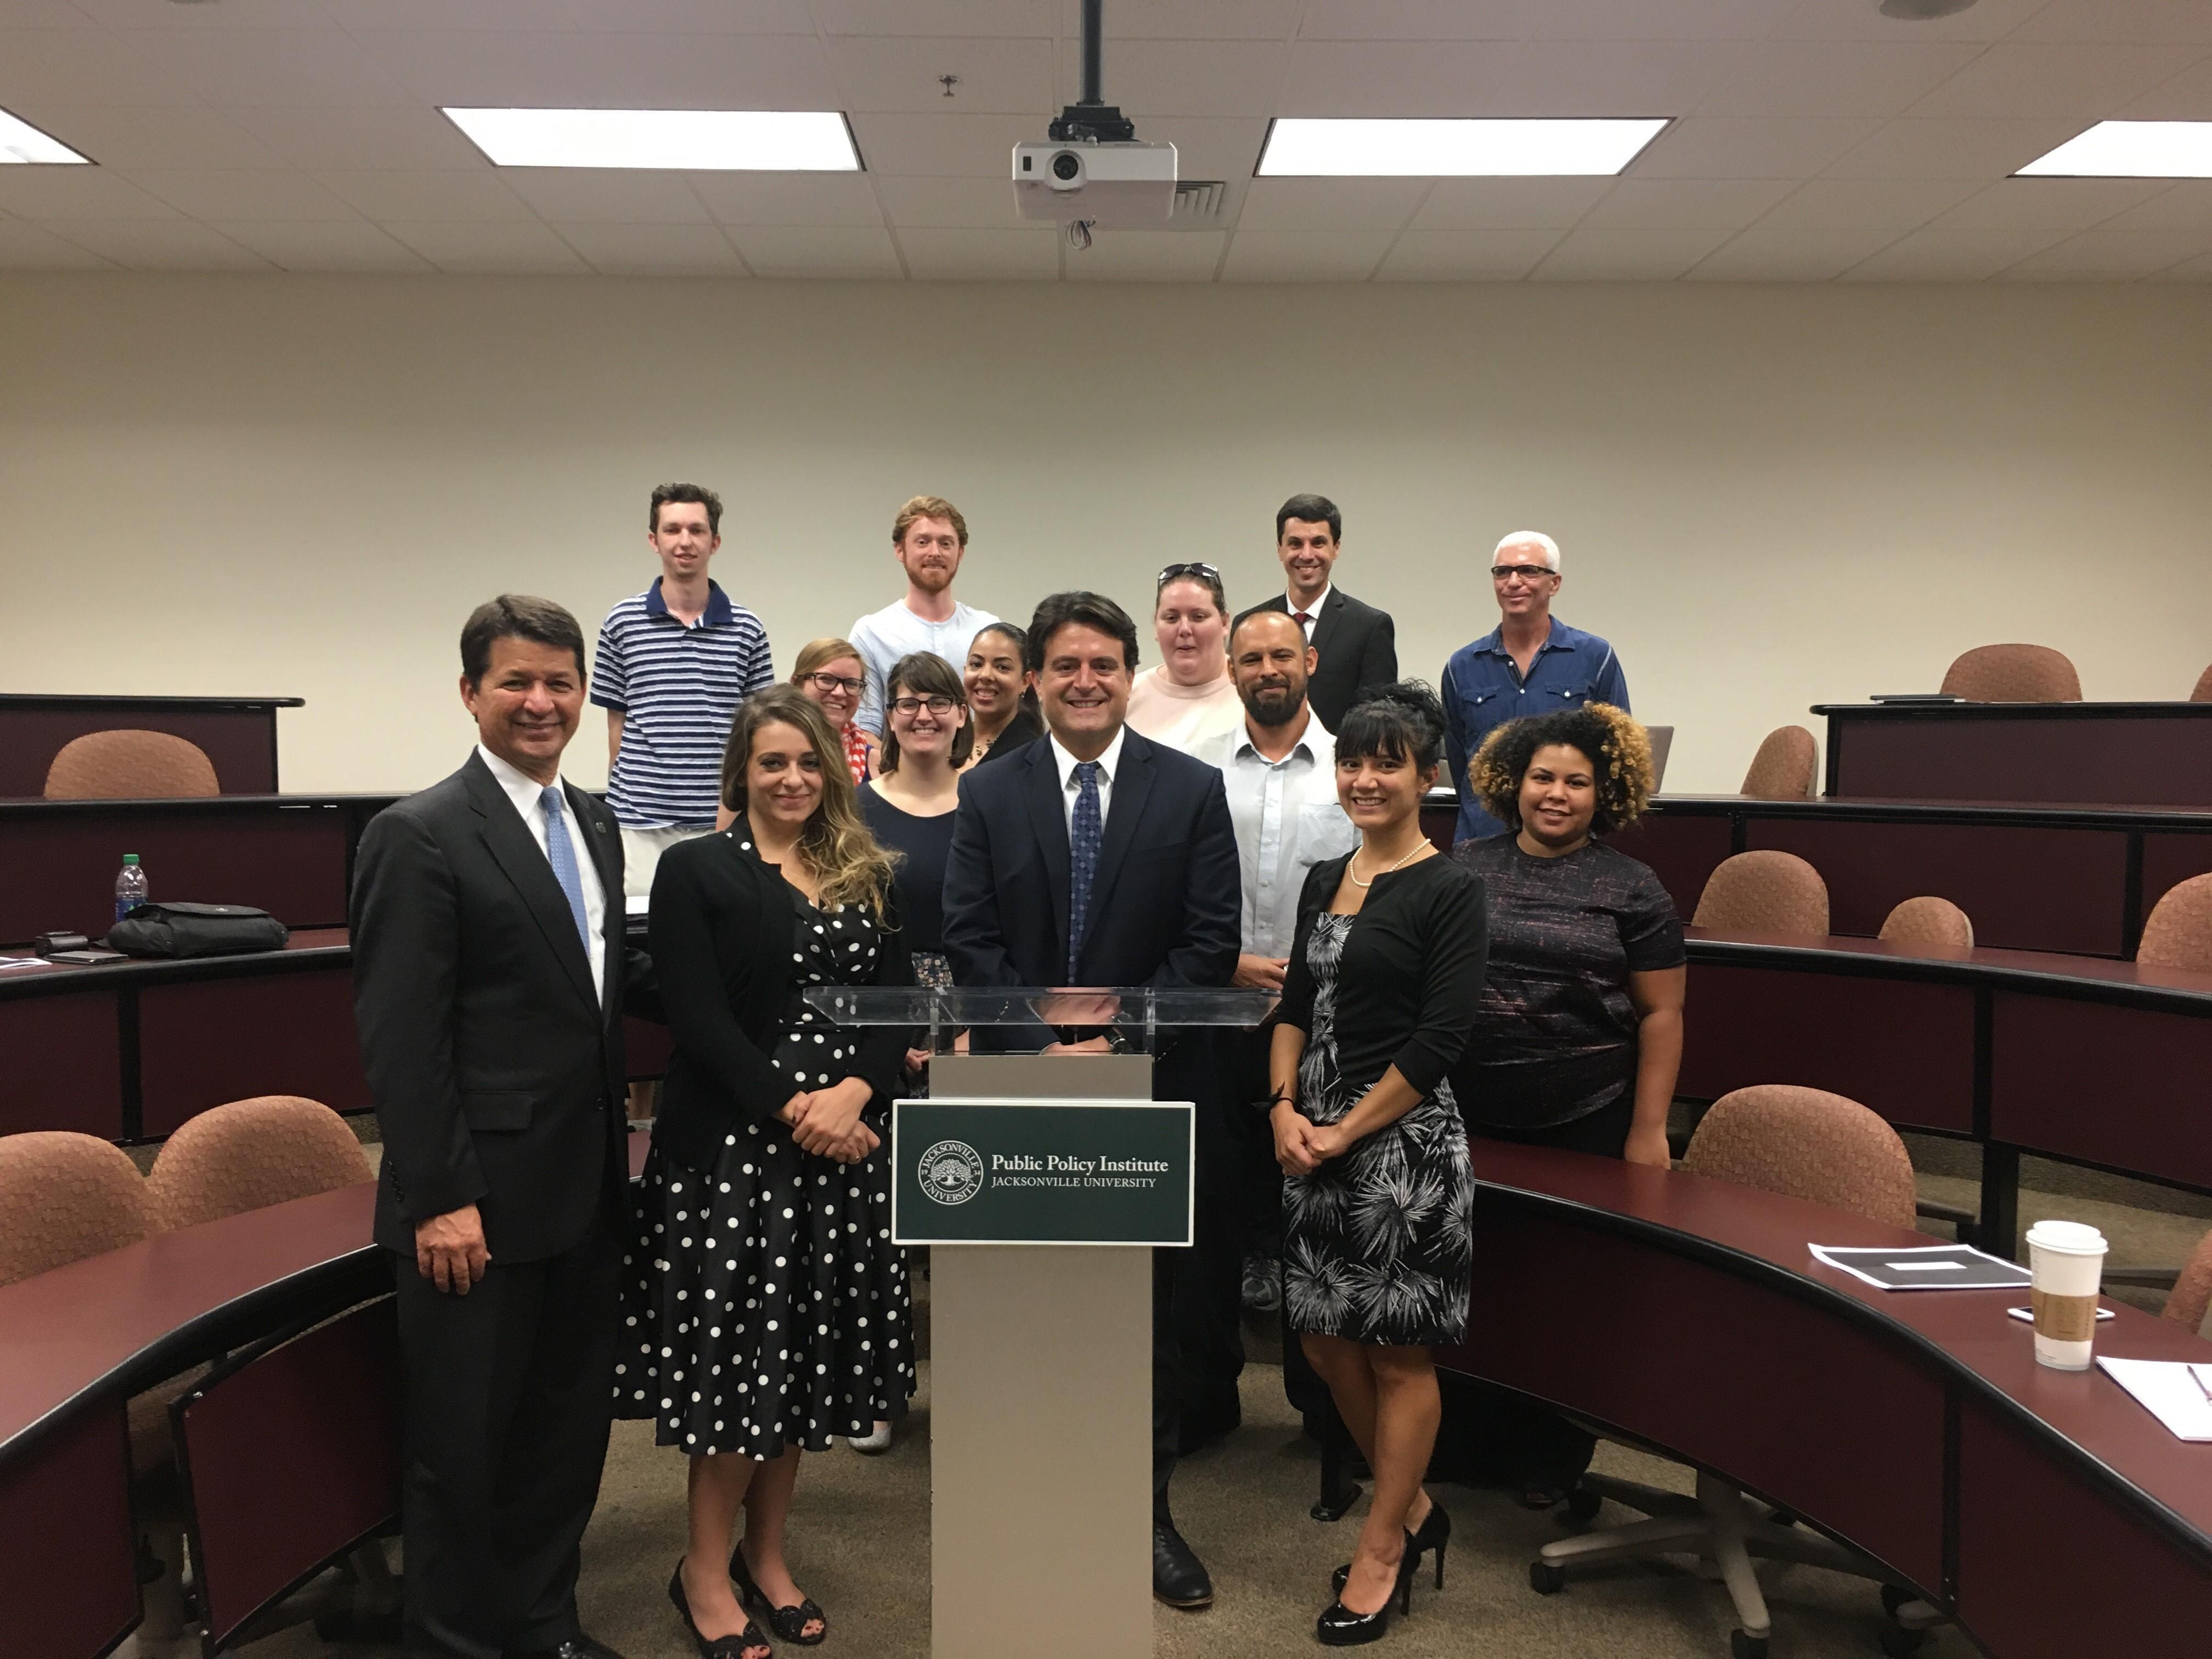 Jason Gabriel, Esq., General Counsel, City of Jacksonville